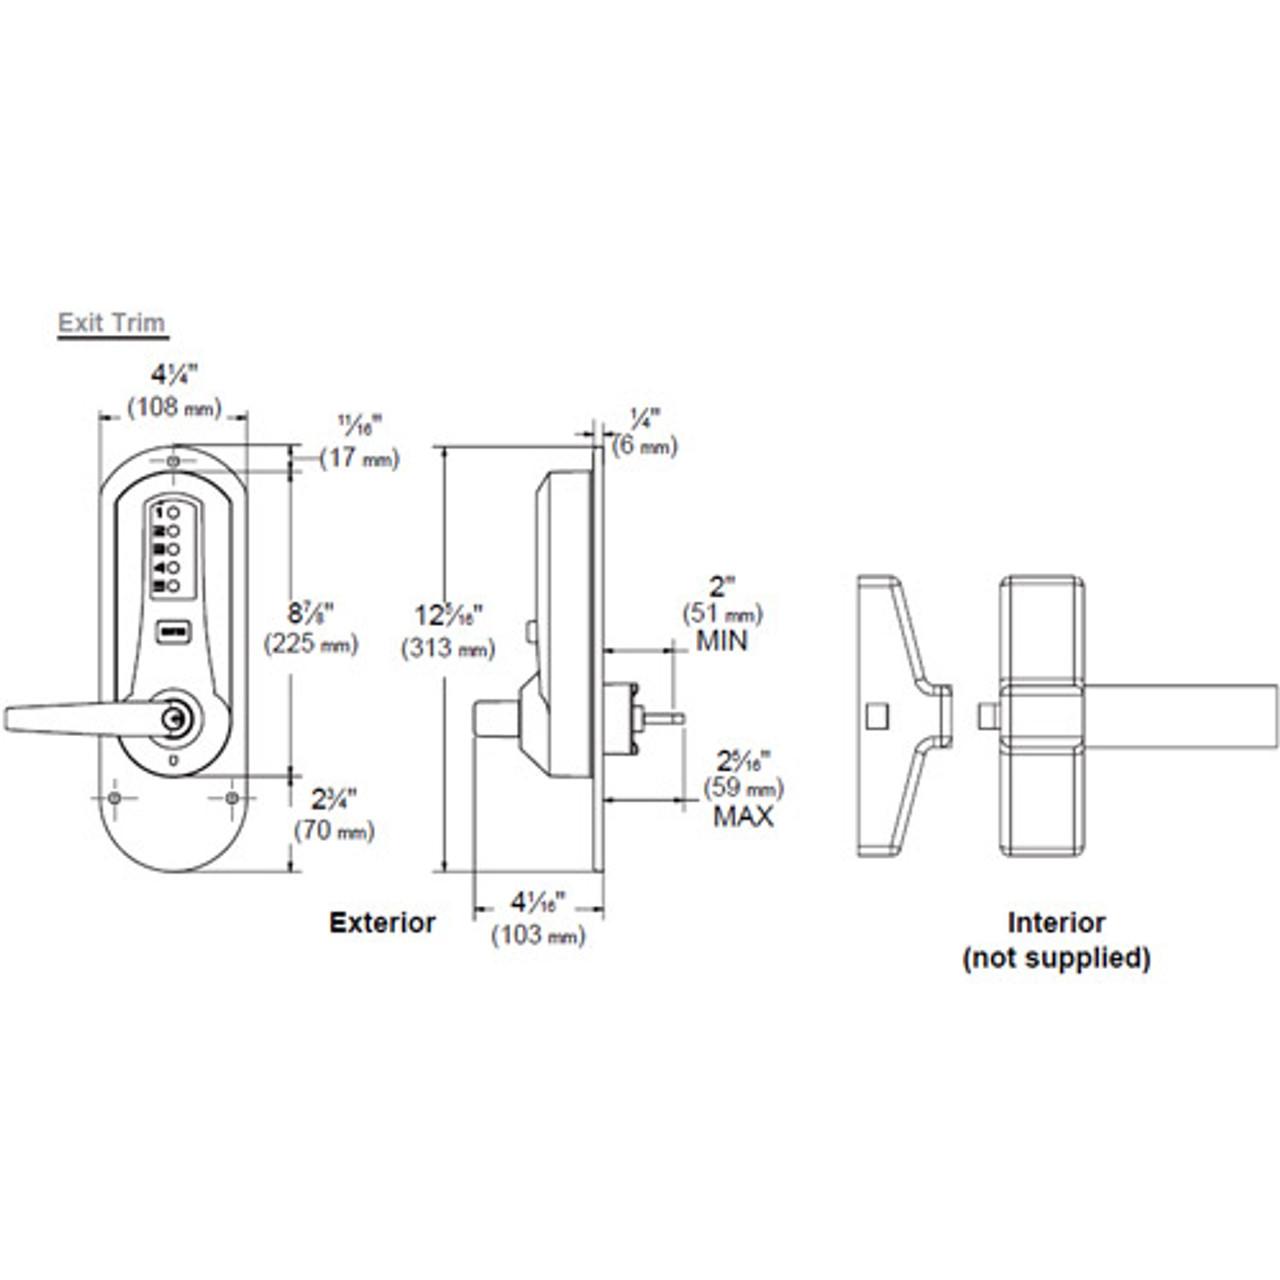 medium resolution of simplex pushbutton with exit trim